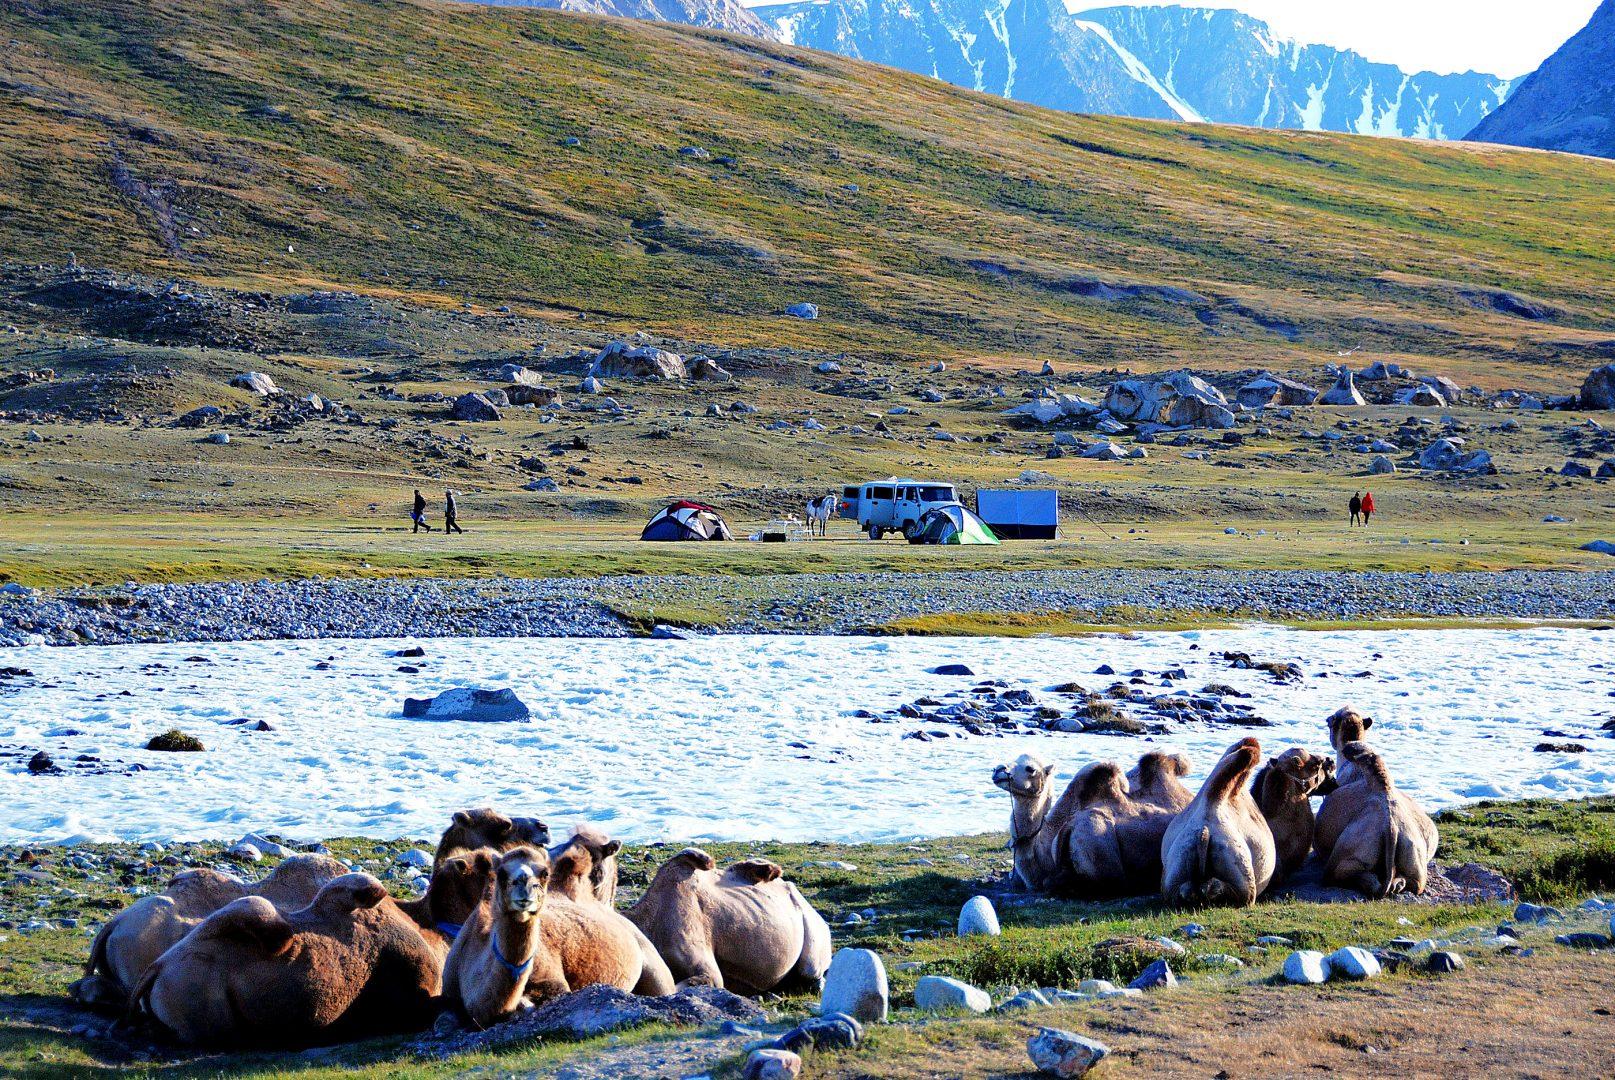 Mongolei-Reise: Am Altai-Gebirge Westmongolei